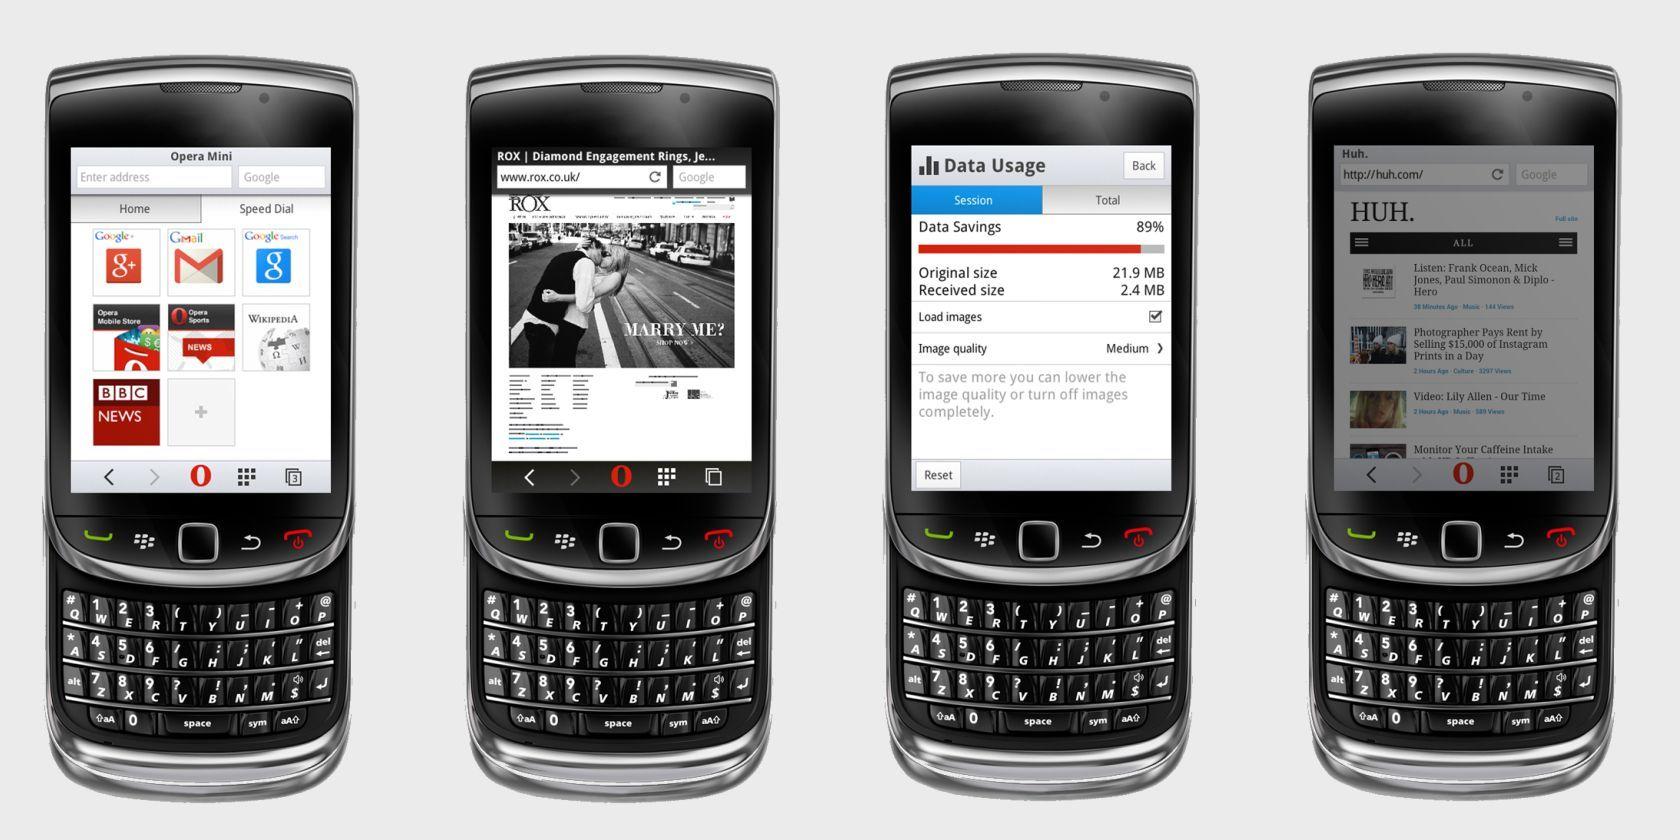 Opera Mini 8 Redesign Brings Private Browsing For Java & BlackBerry Phones